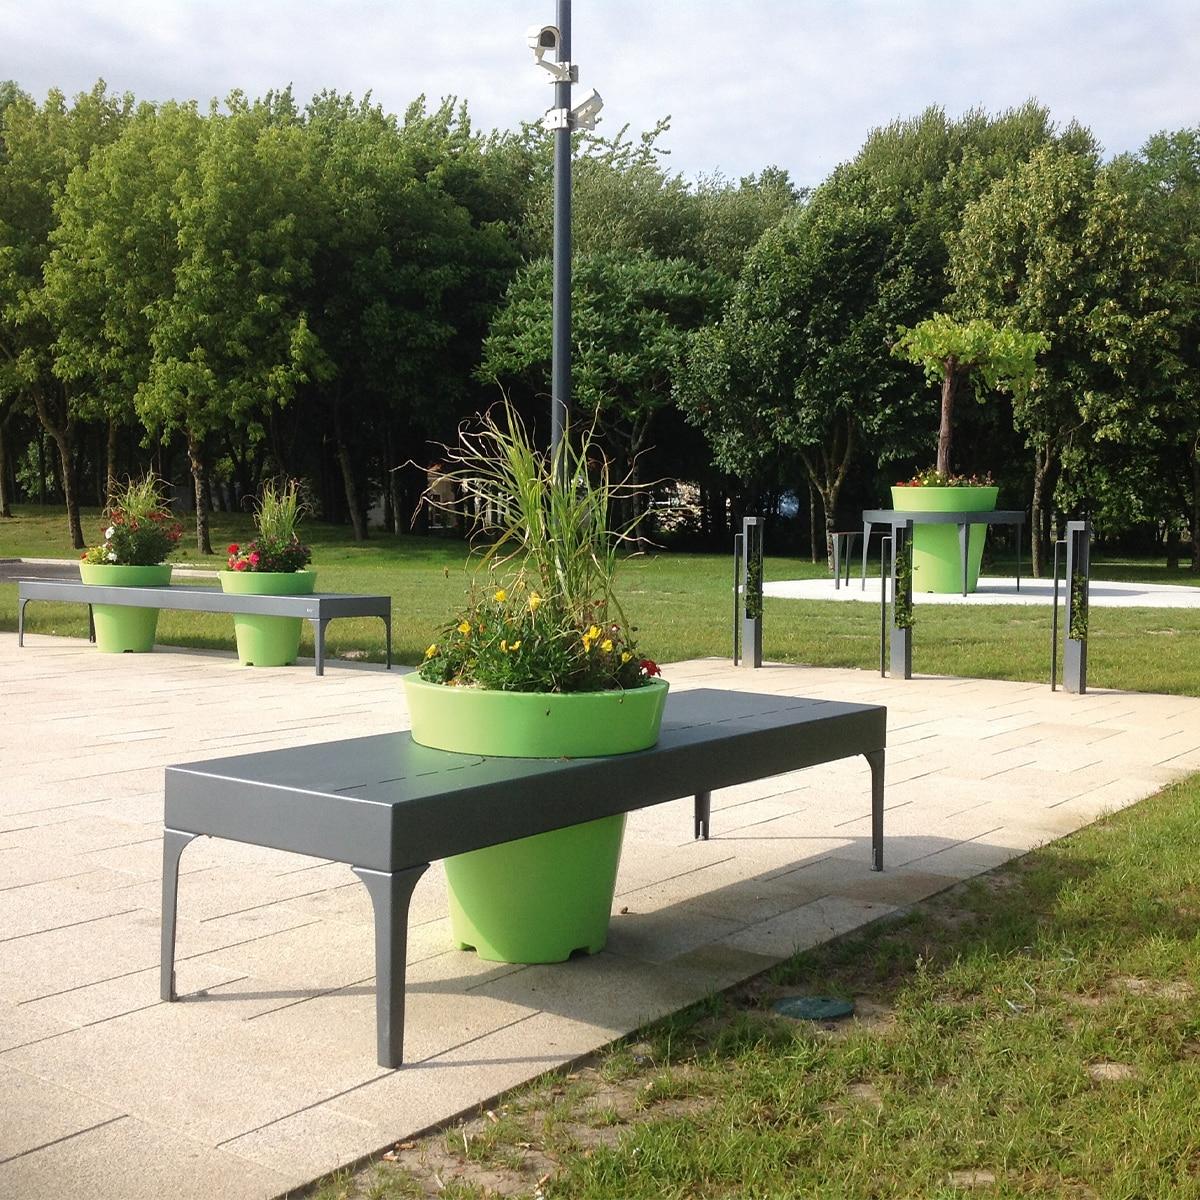 ATECH-urban-park-planning-a-linea-range-street-bench